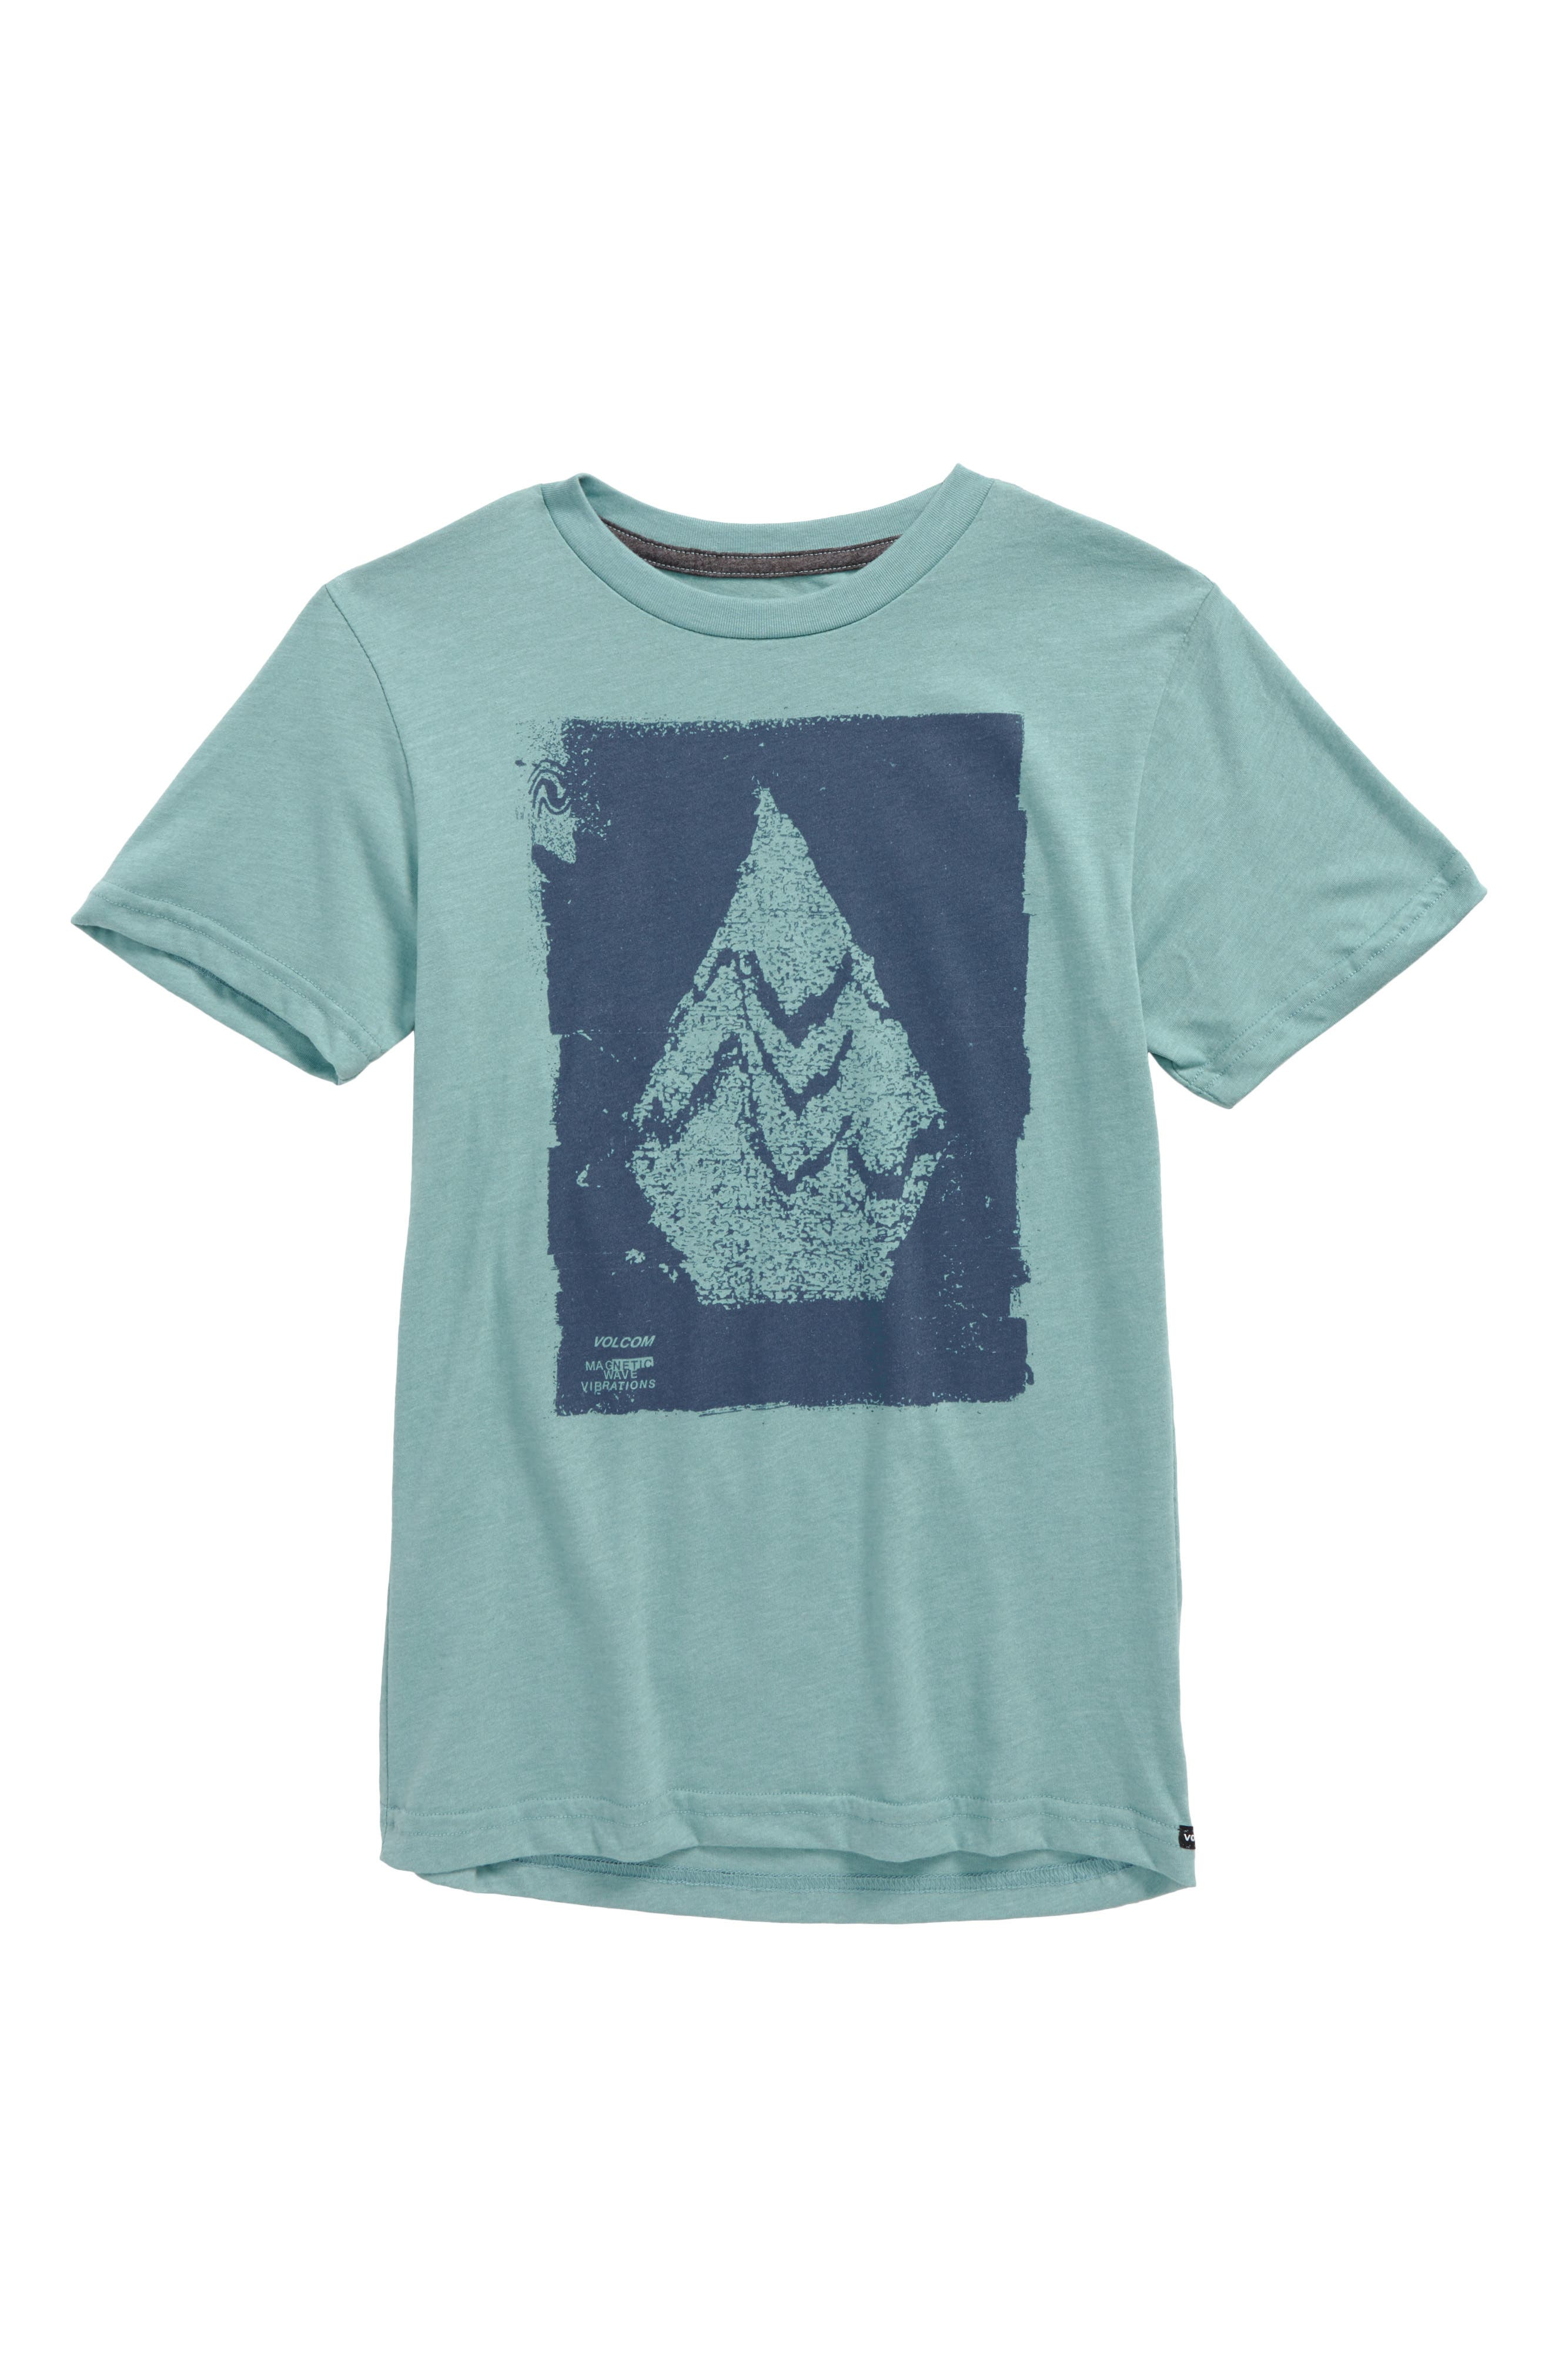 Disruption Graphic T-Shirt,                         Main,                         color, 474